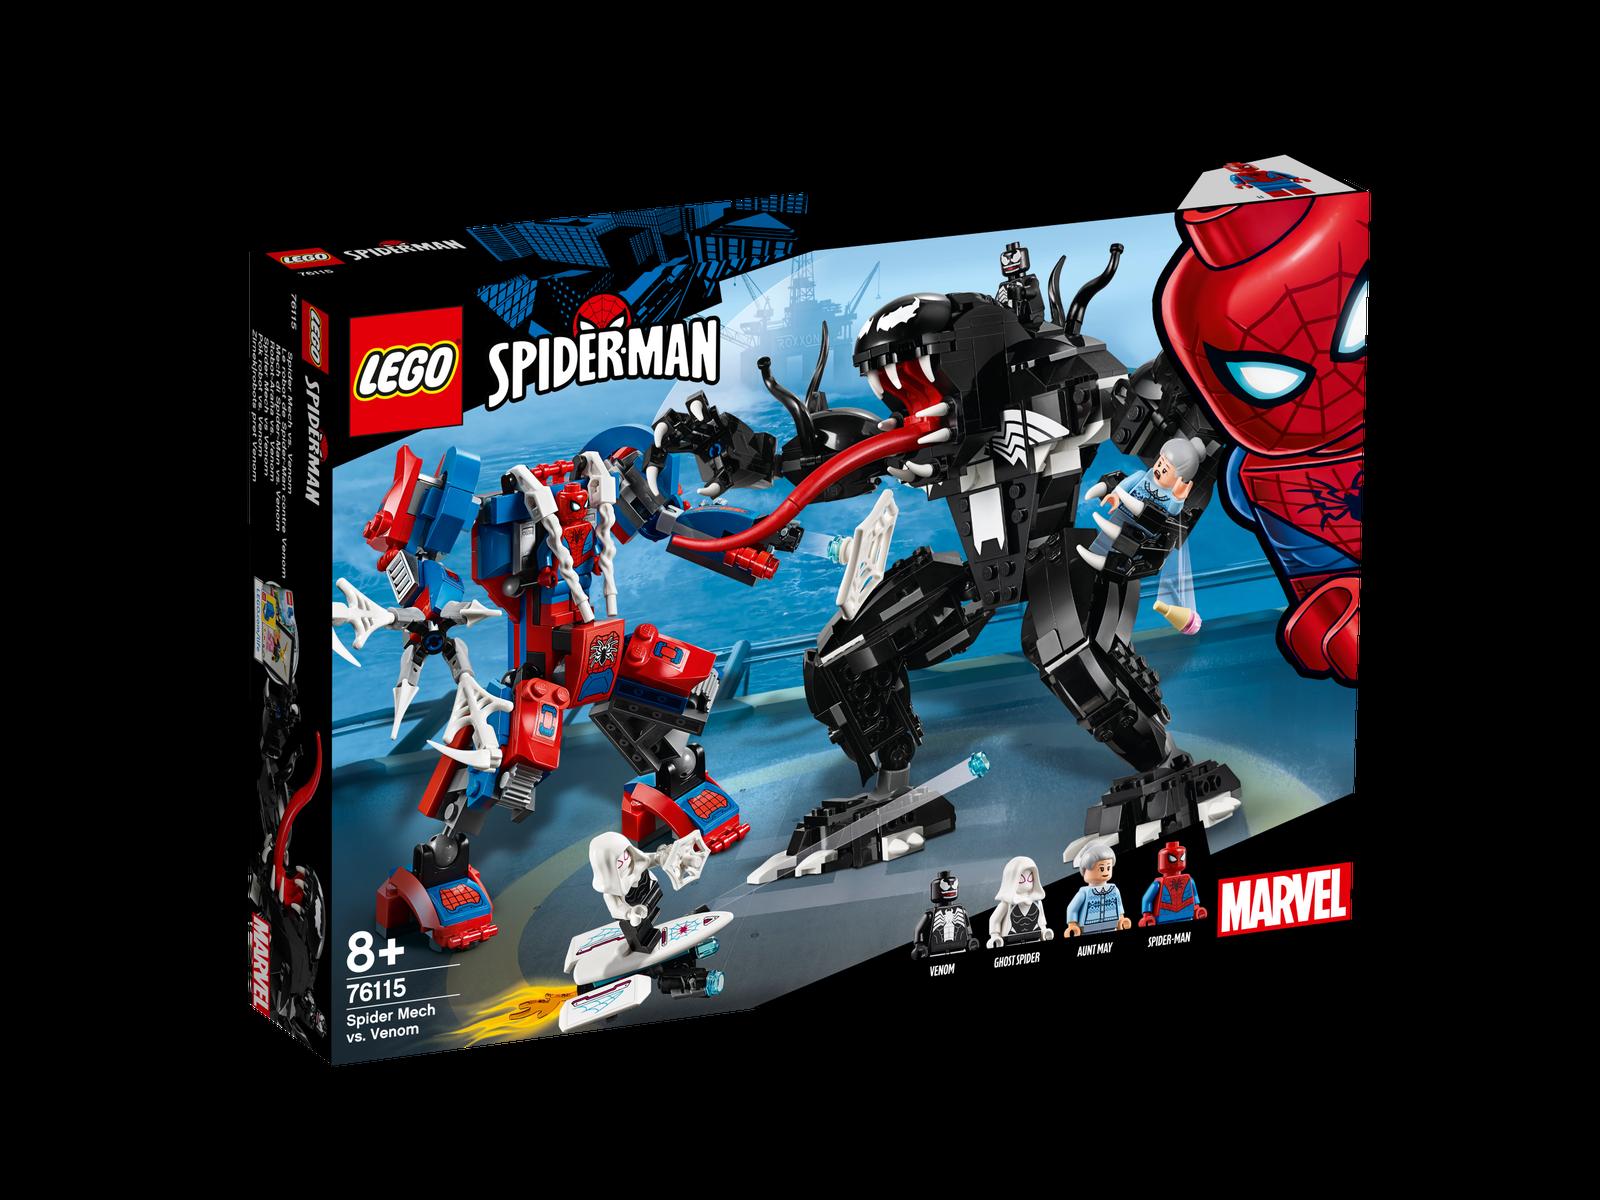 LEGO  ® MARVEL SUPER HEROES 76115 SPIDER Mech vs. Venom NUOVO OVP _ nuovo MISB NRFB  l'ultimo